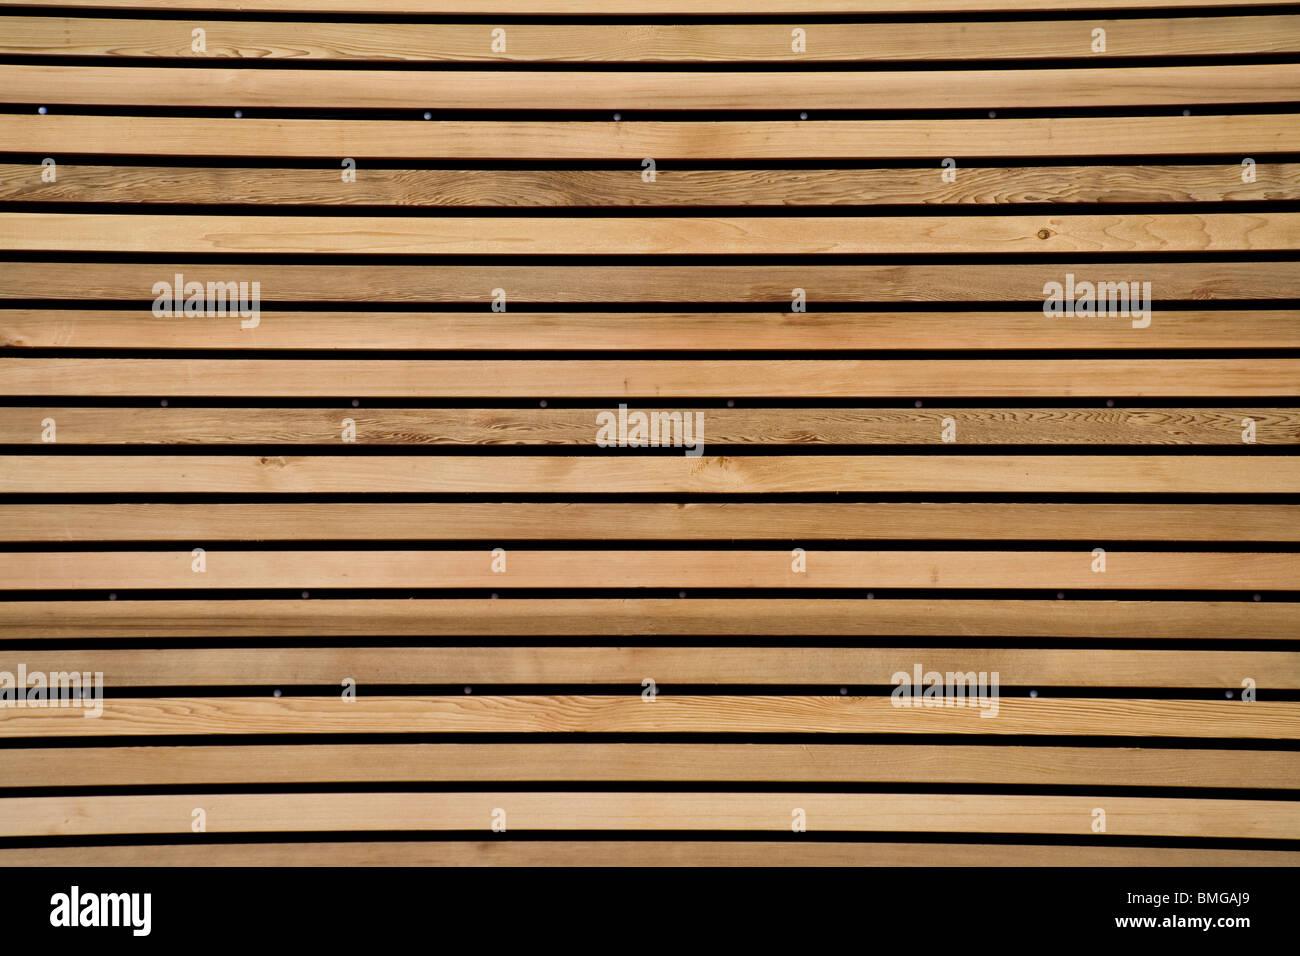 Patrón de madera cerca de fondo Imagen De Stock